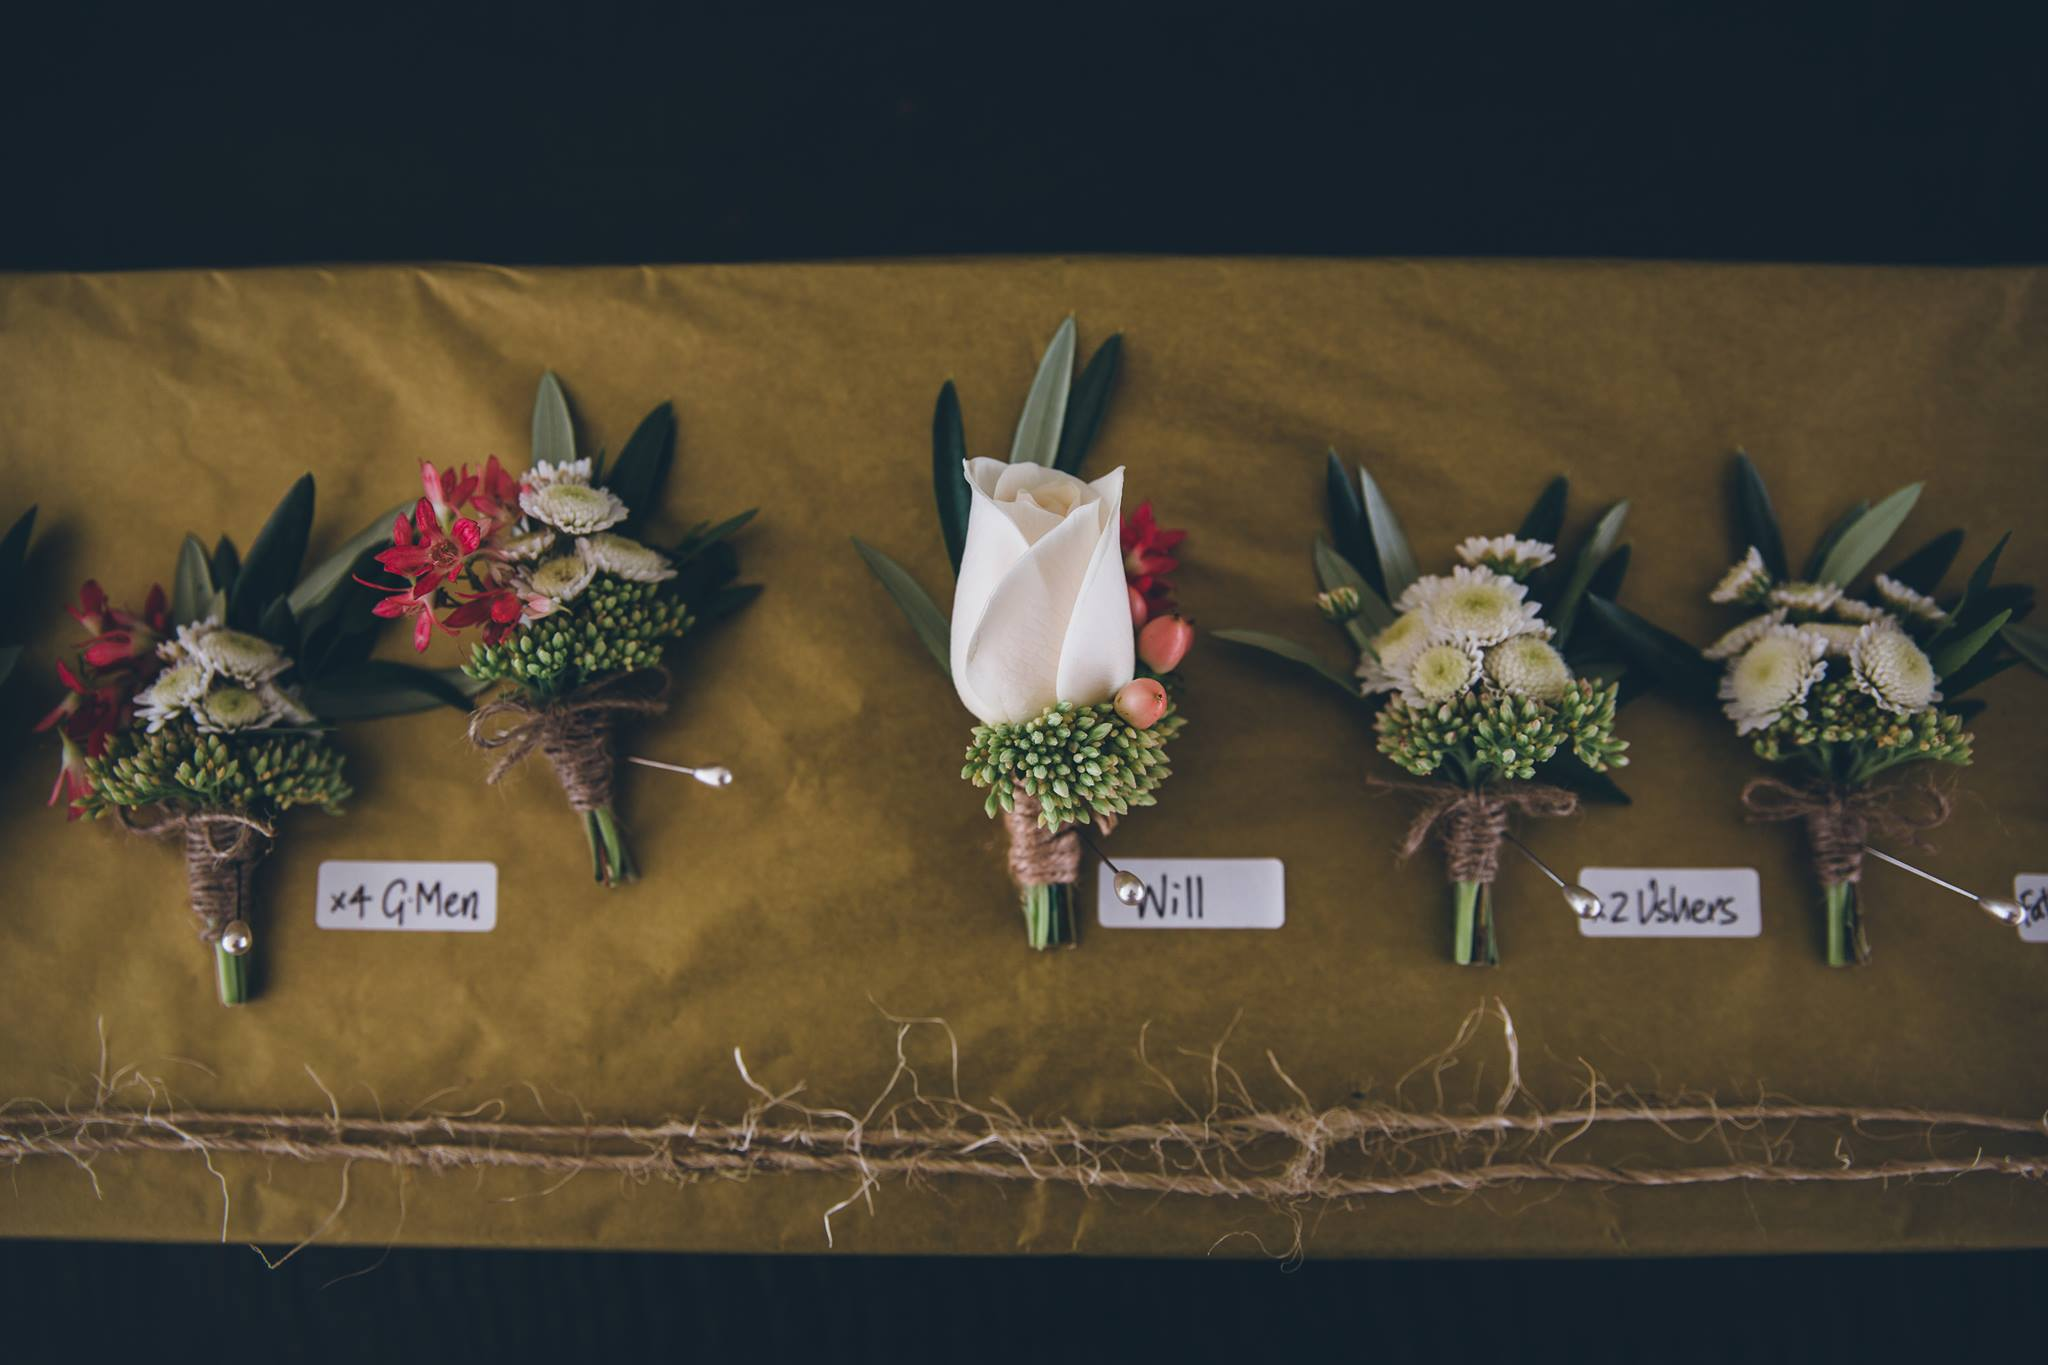 Crimson_wedding-Flowers10.jpg